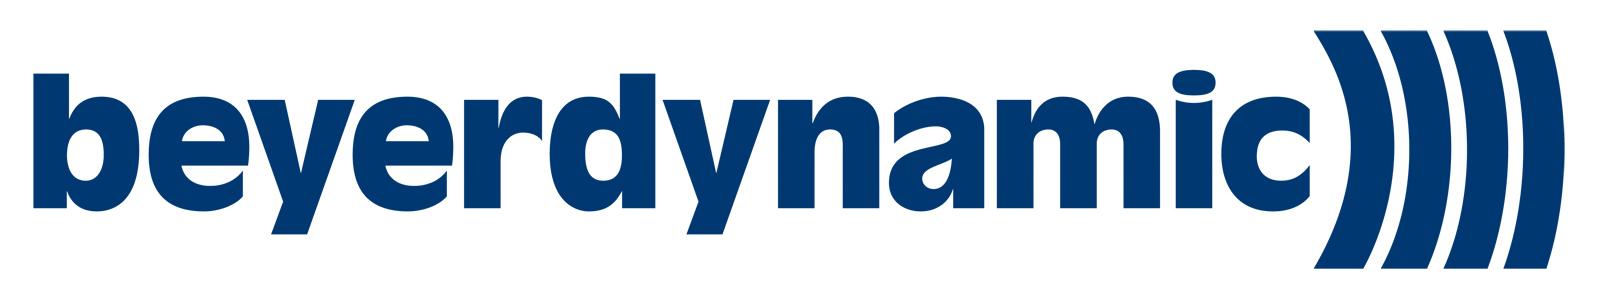 beyerdynamic_logo_RGB_01.jpg